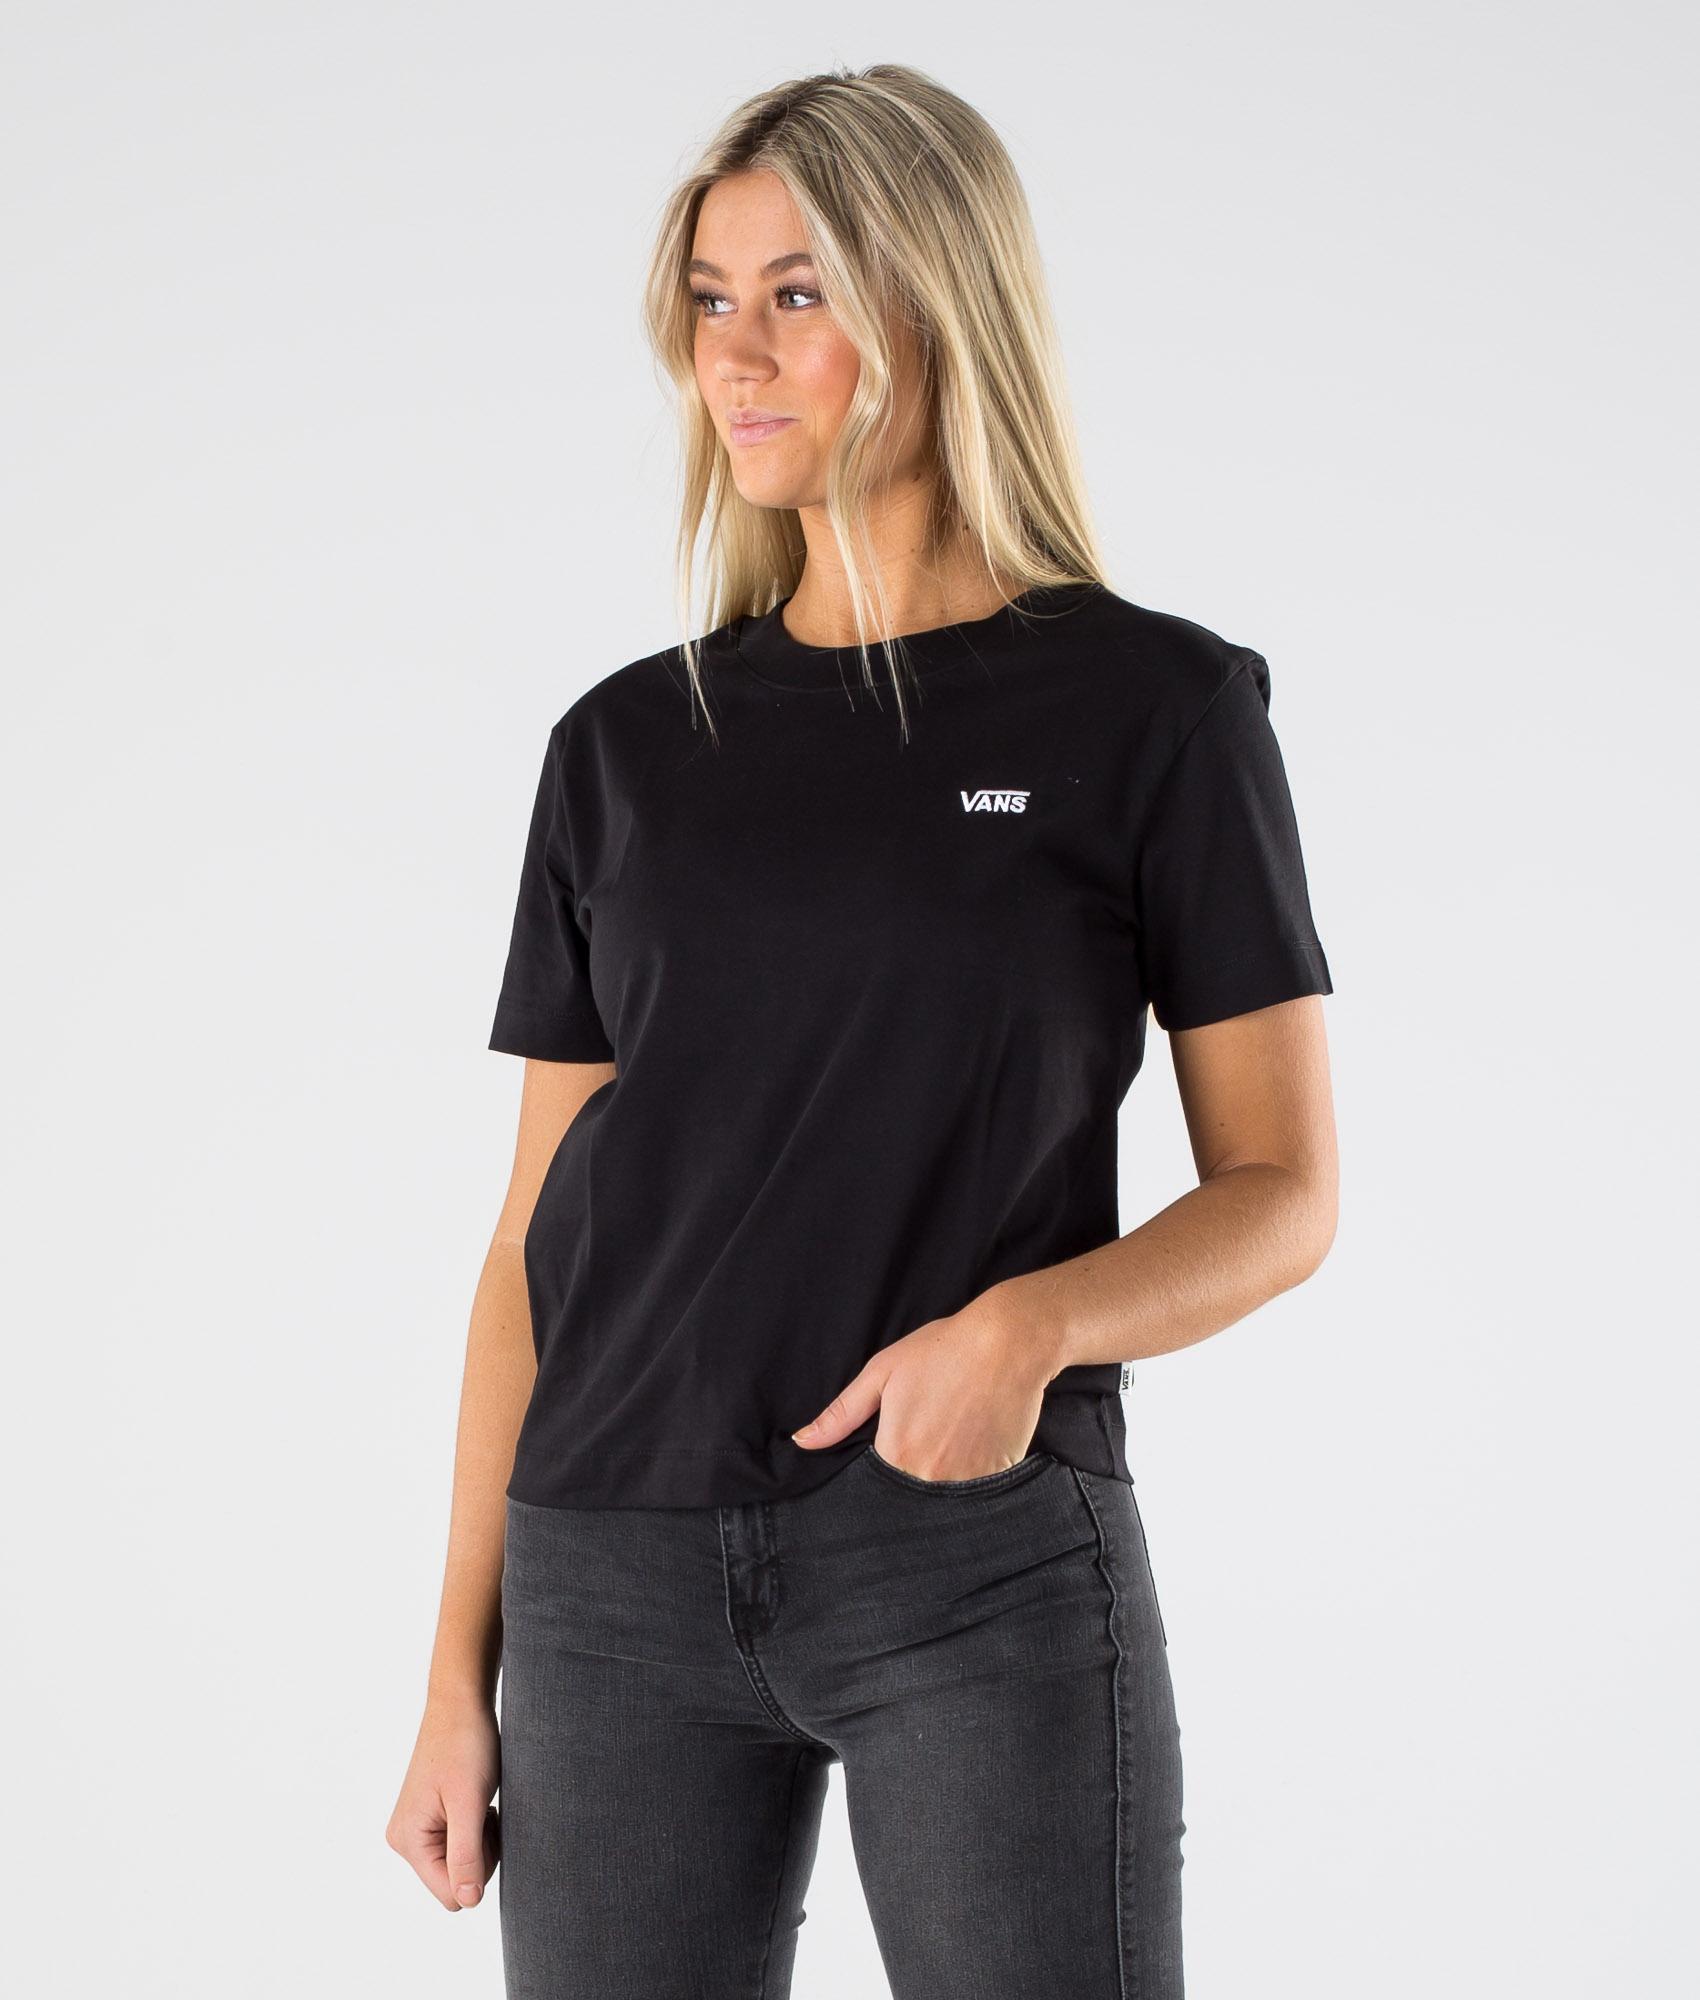 Vans Junior V Boxy T-shirt Black